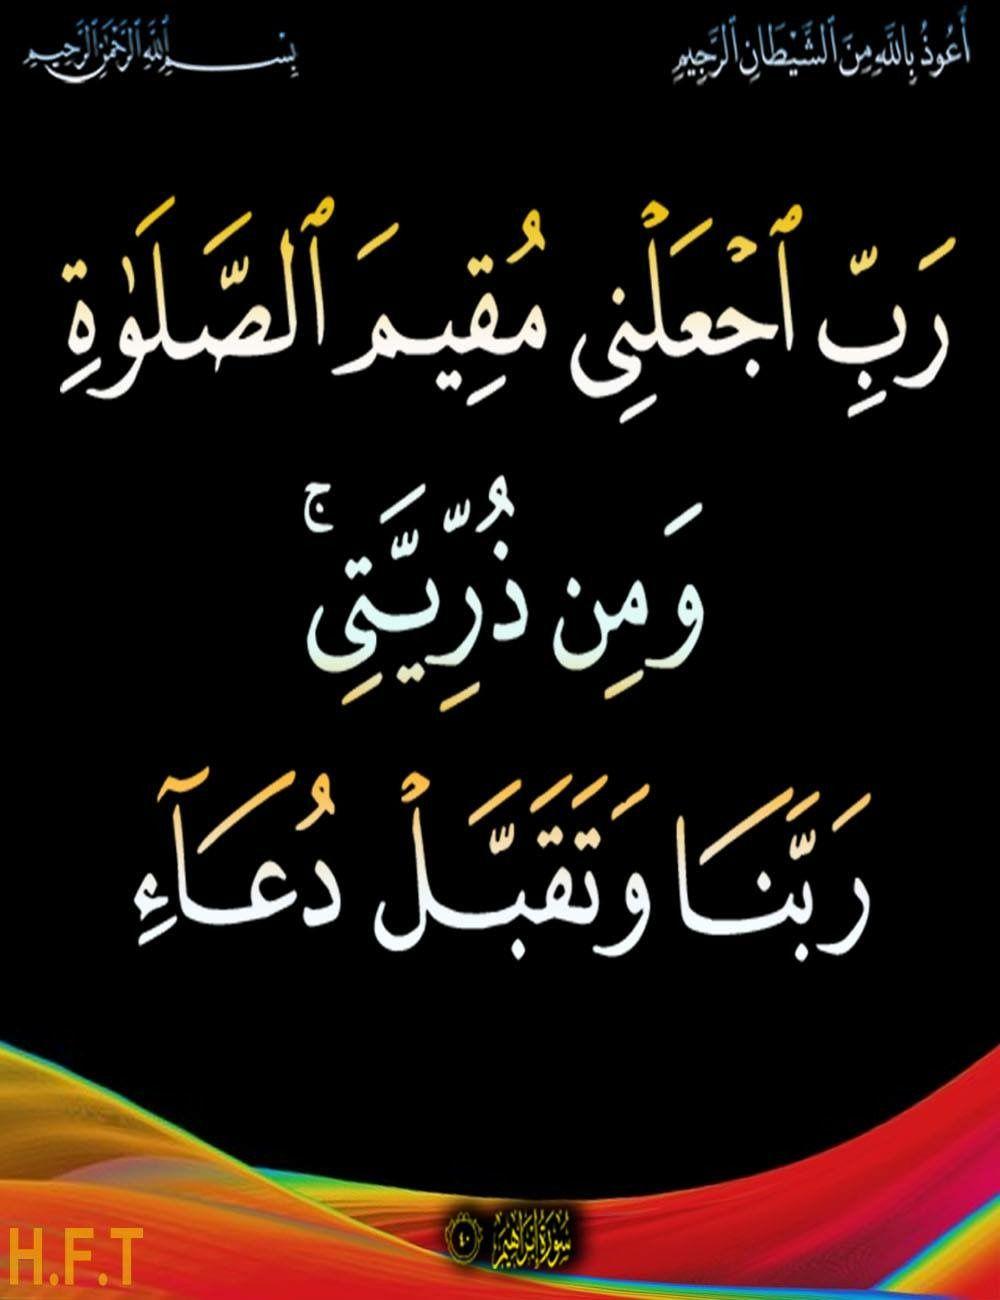 ٤٠ ابراهيم Calligraphy Arabic Calligraphy